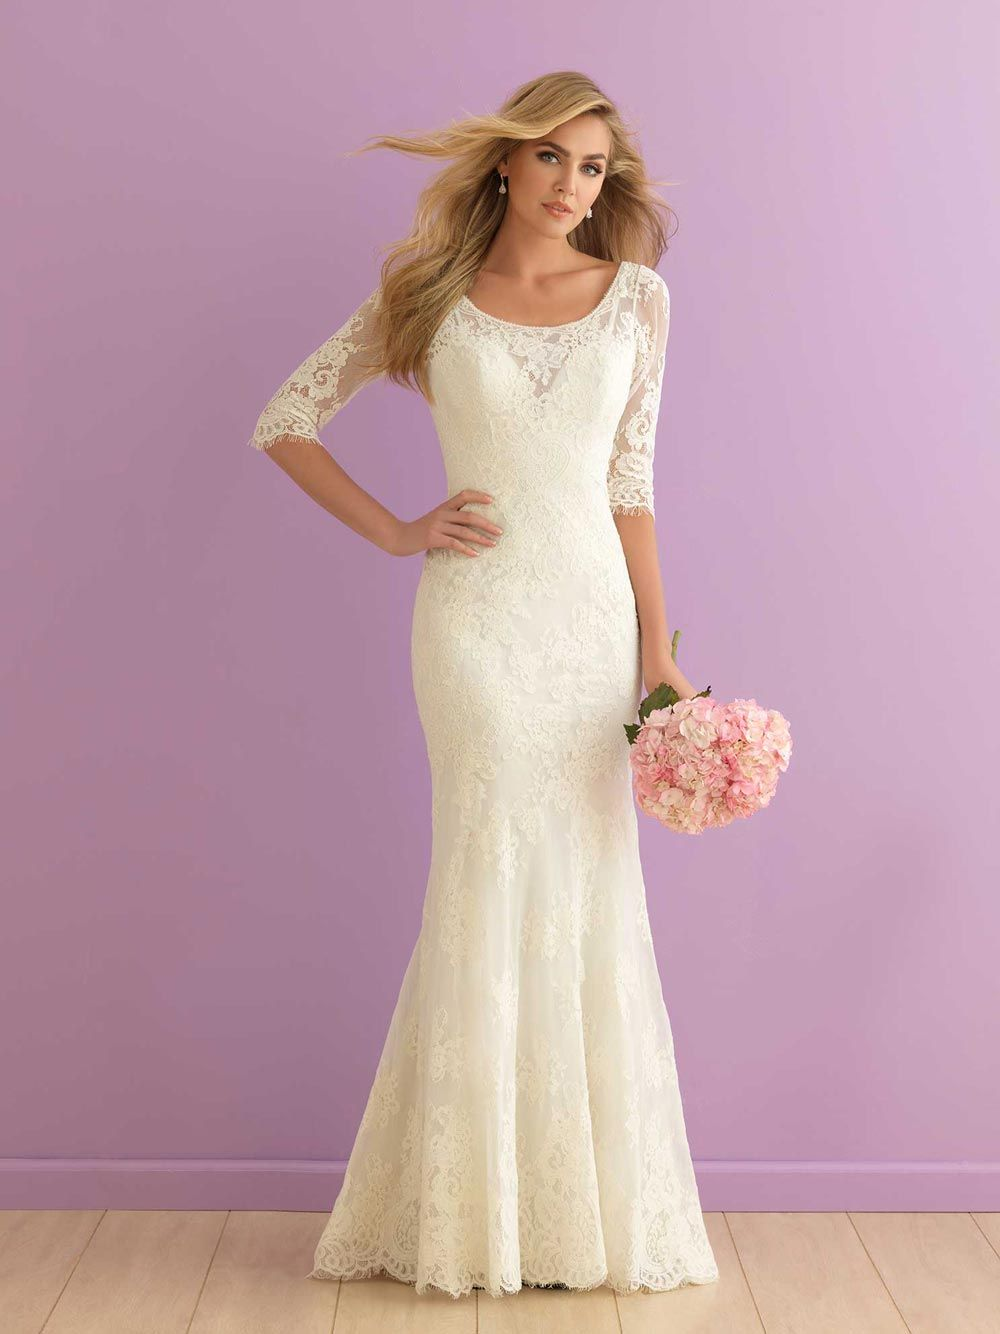 Church Wedding Dresses 29 Modern But Modest Designs Lace Wedding Dress Vintage Bridal Gowns Wedding Dresses